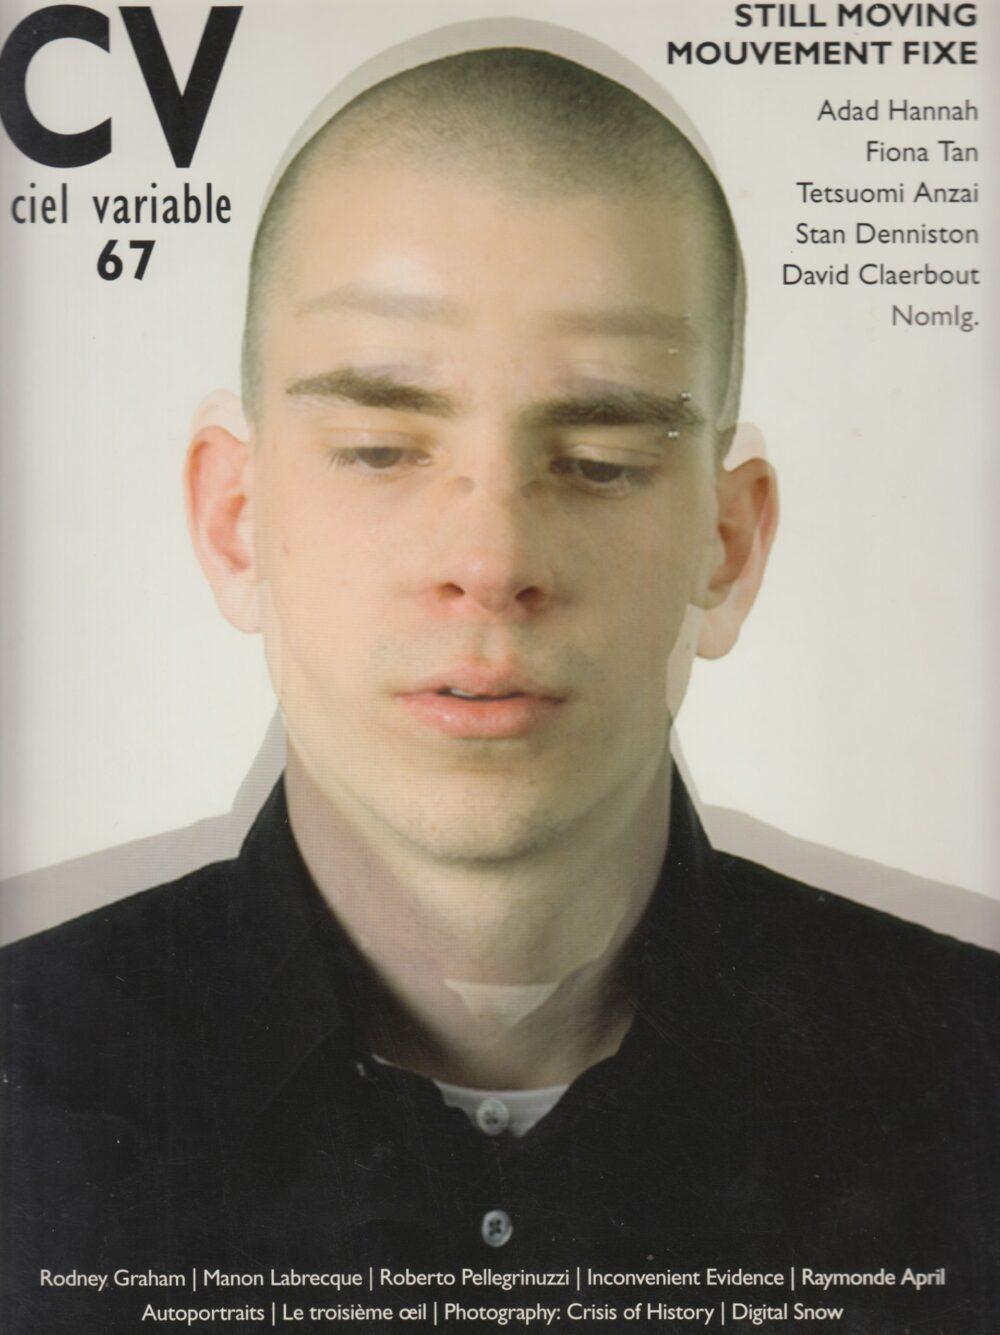 Michael Snow Digital Snow, CV-Ciel Variable 67, 2002